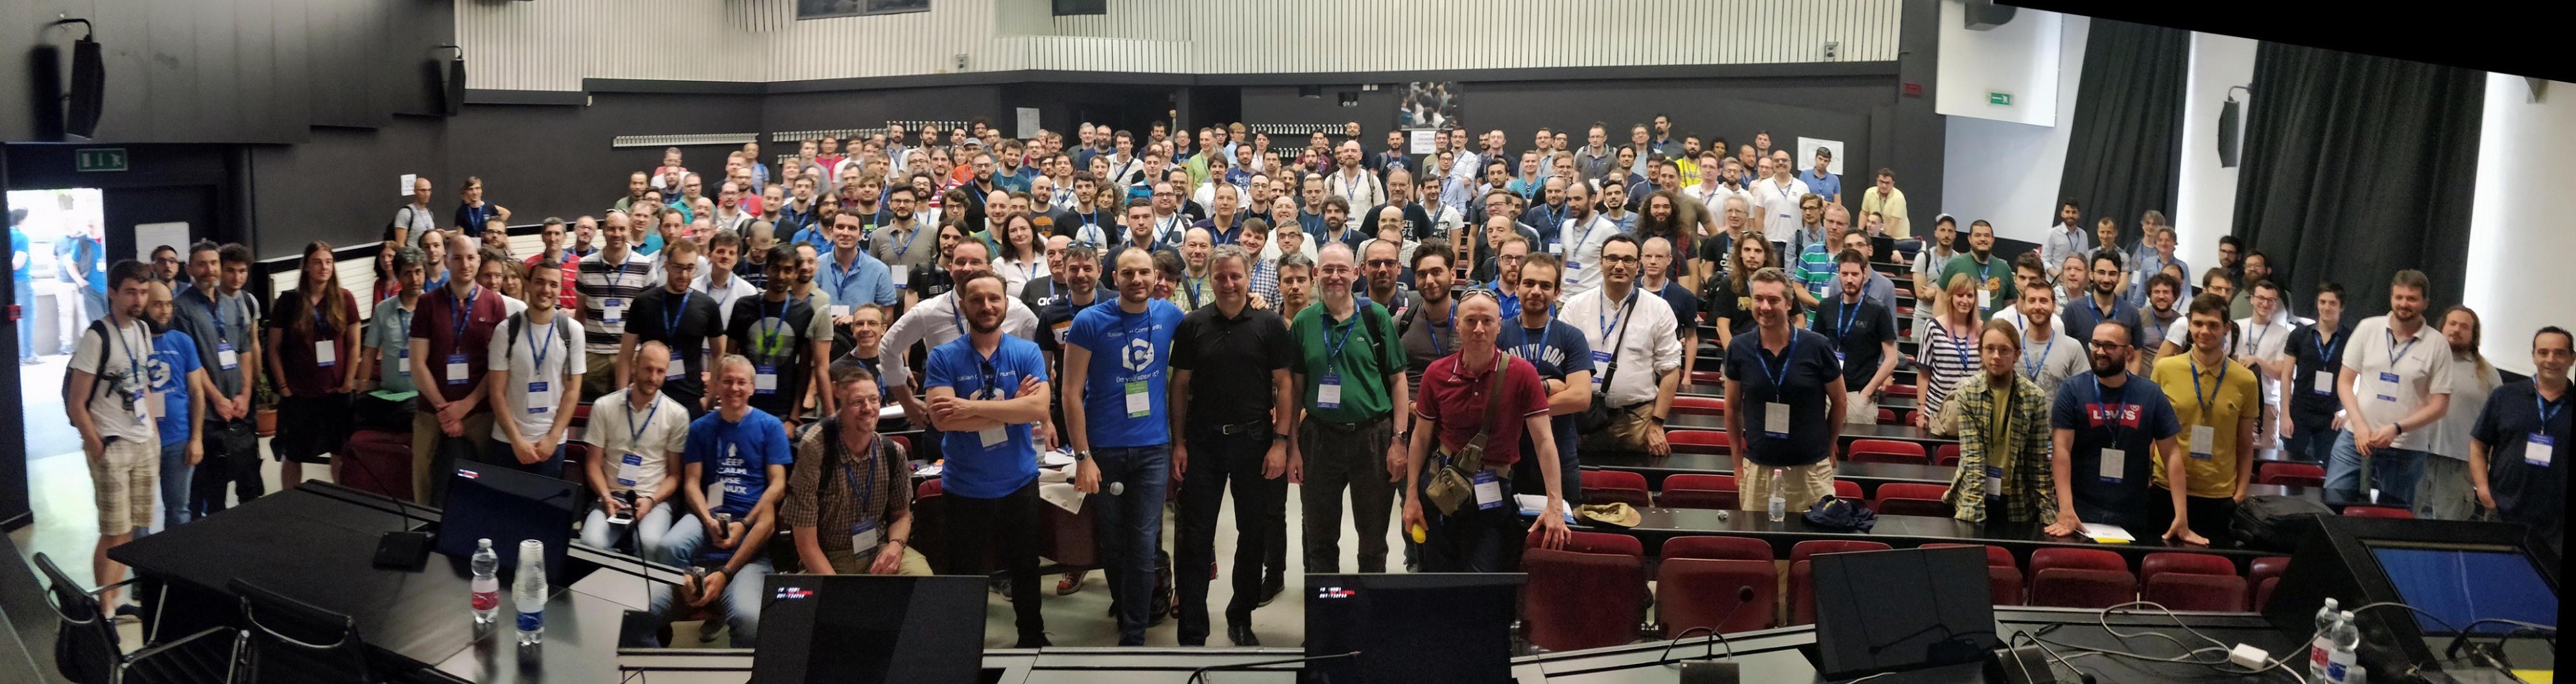 Italian C++ Conference 2019 Panorama